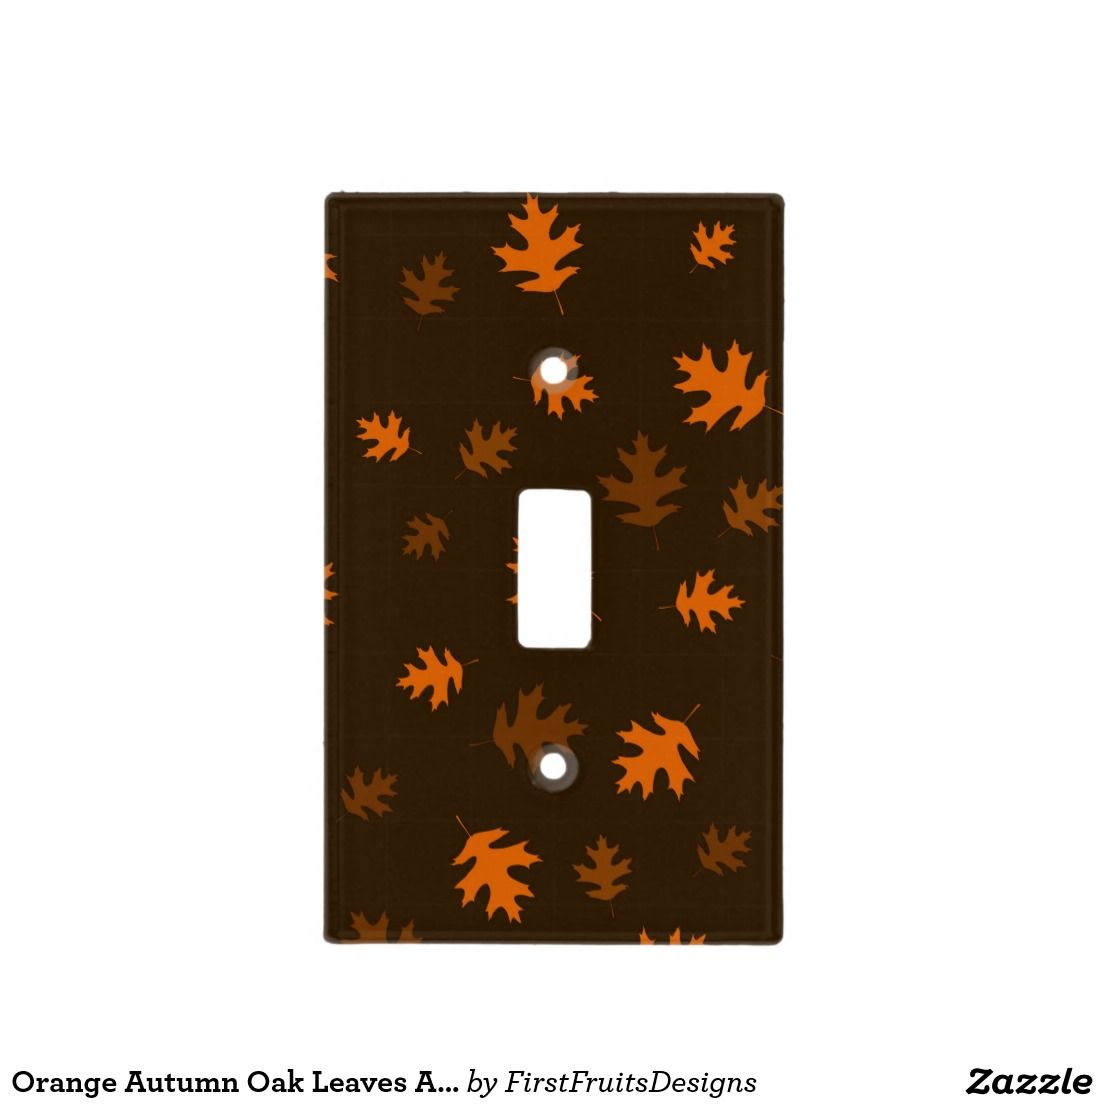 Orange Autumn Oak Leaves Against Dark Brown Light Switch Cover Bed